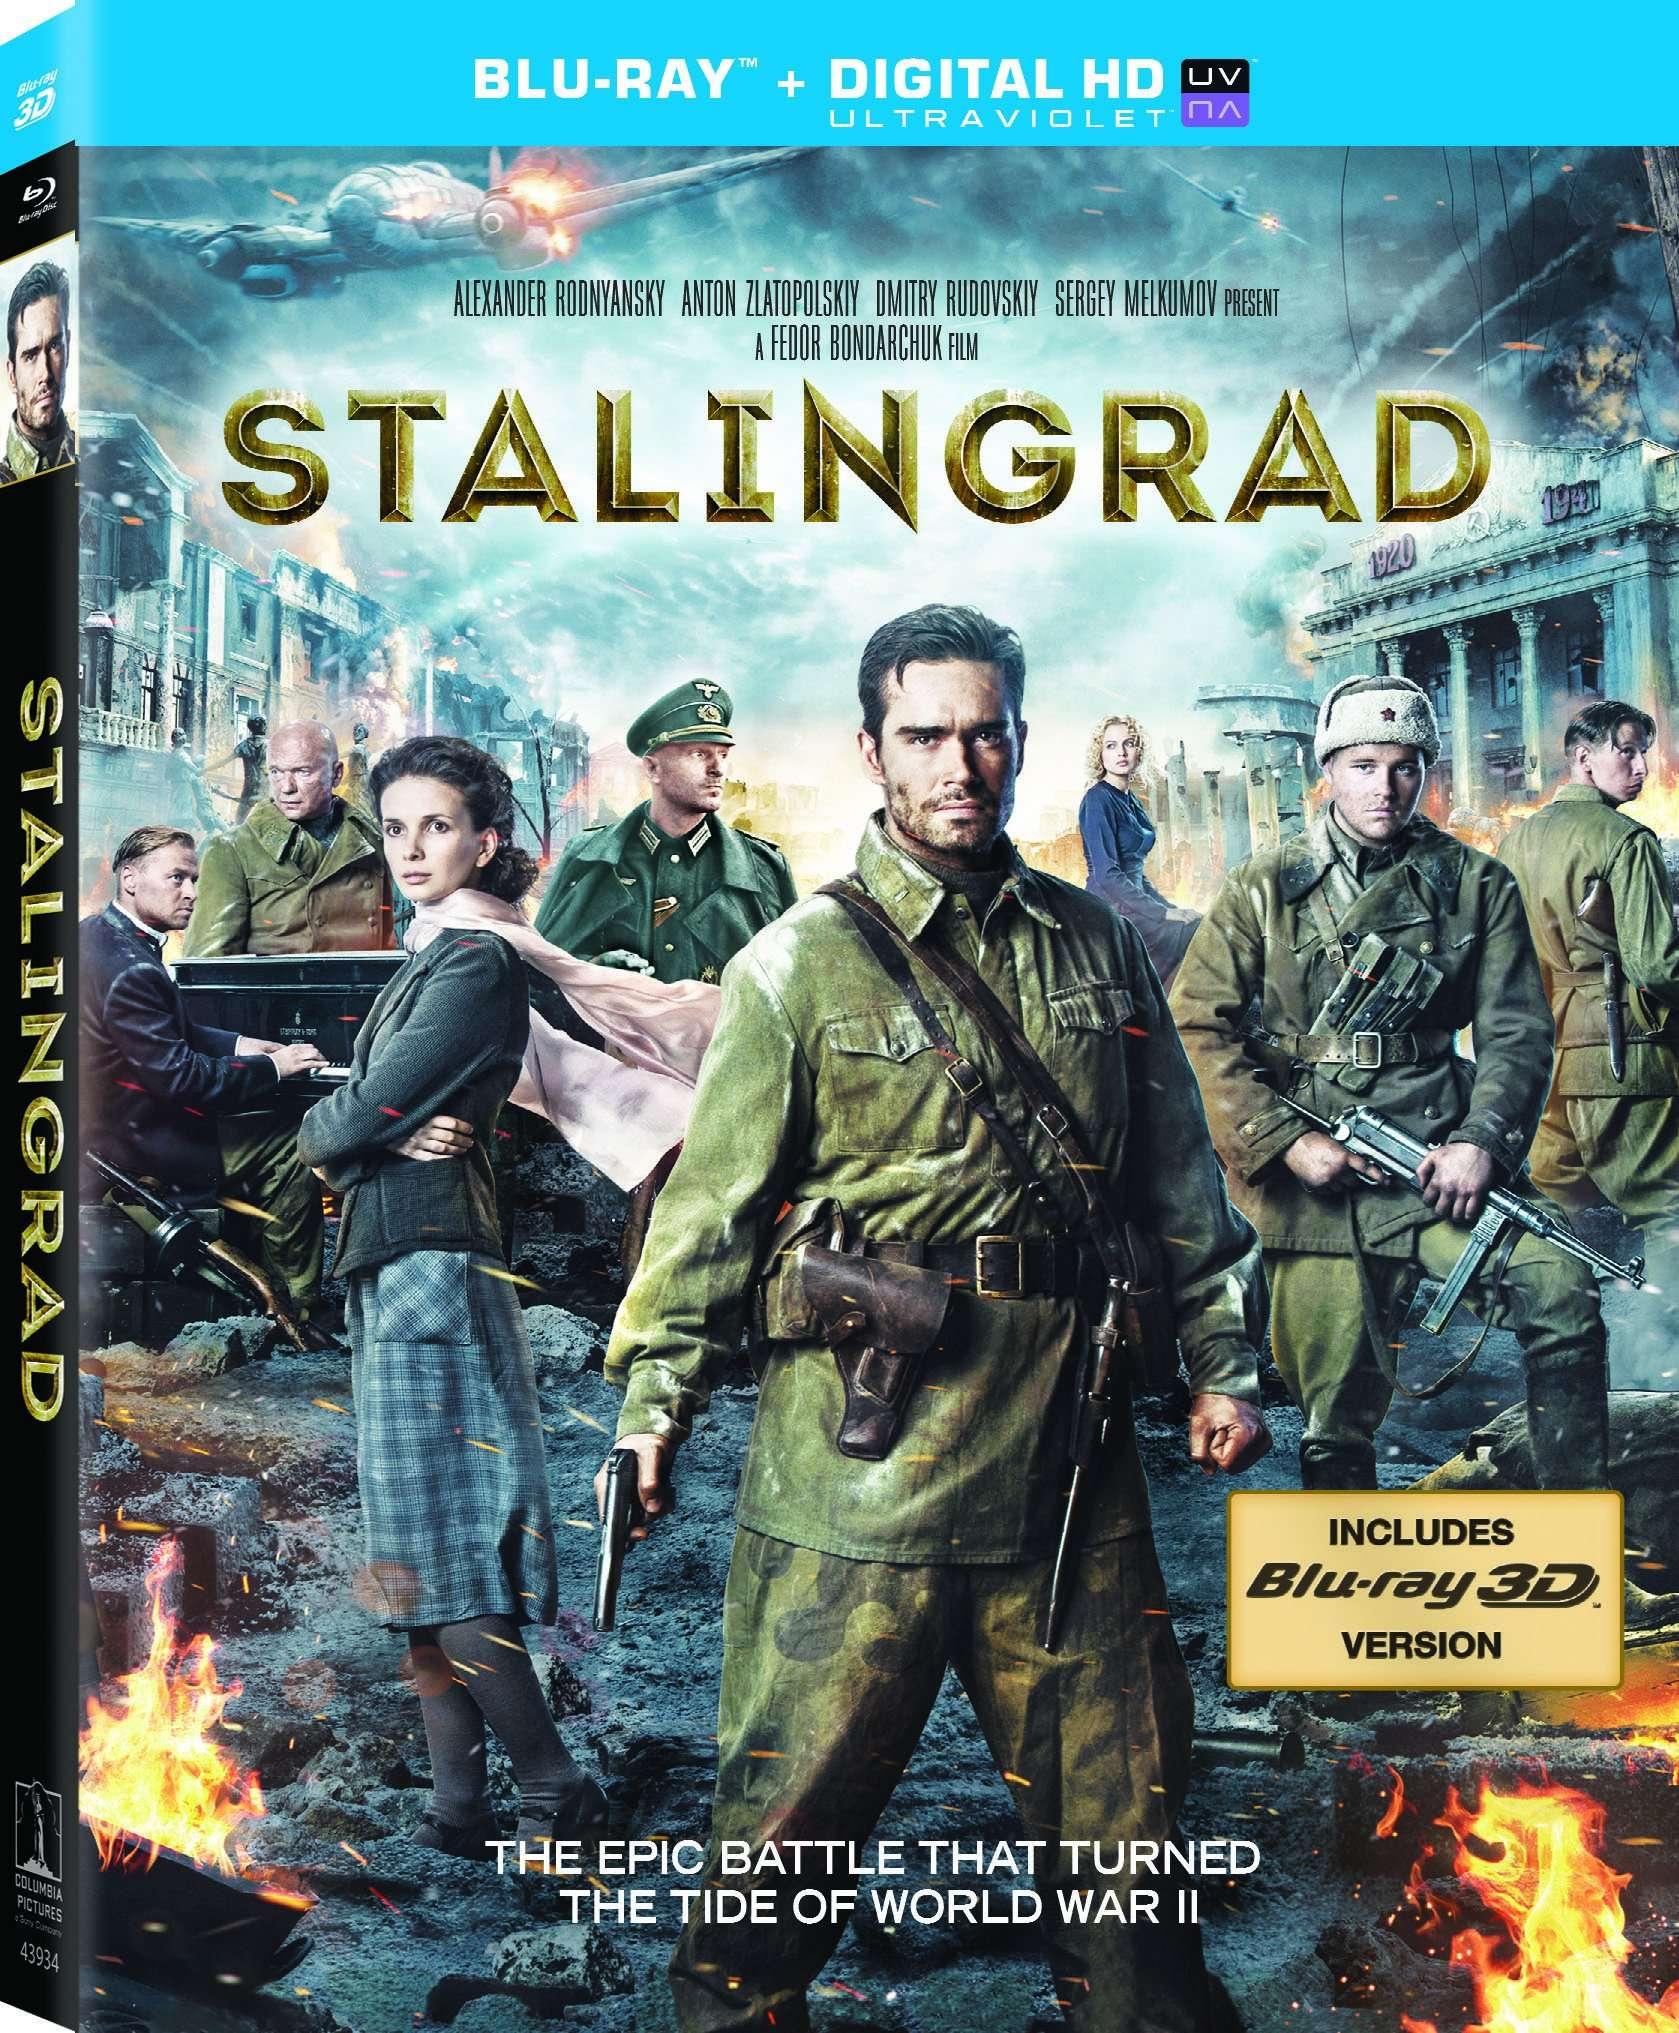 Stalingrad (2013) MKV 3D 1080p BluRay Half-OU Ita AC3  Eng DTS-HD Subs - DDN